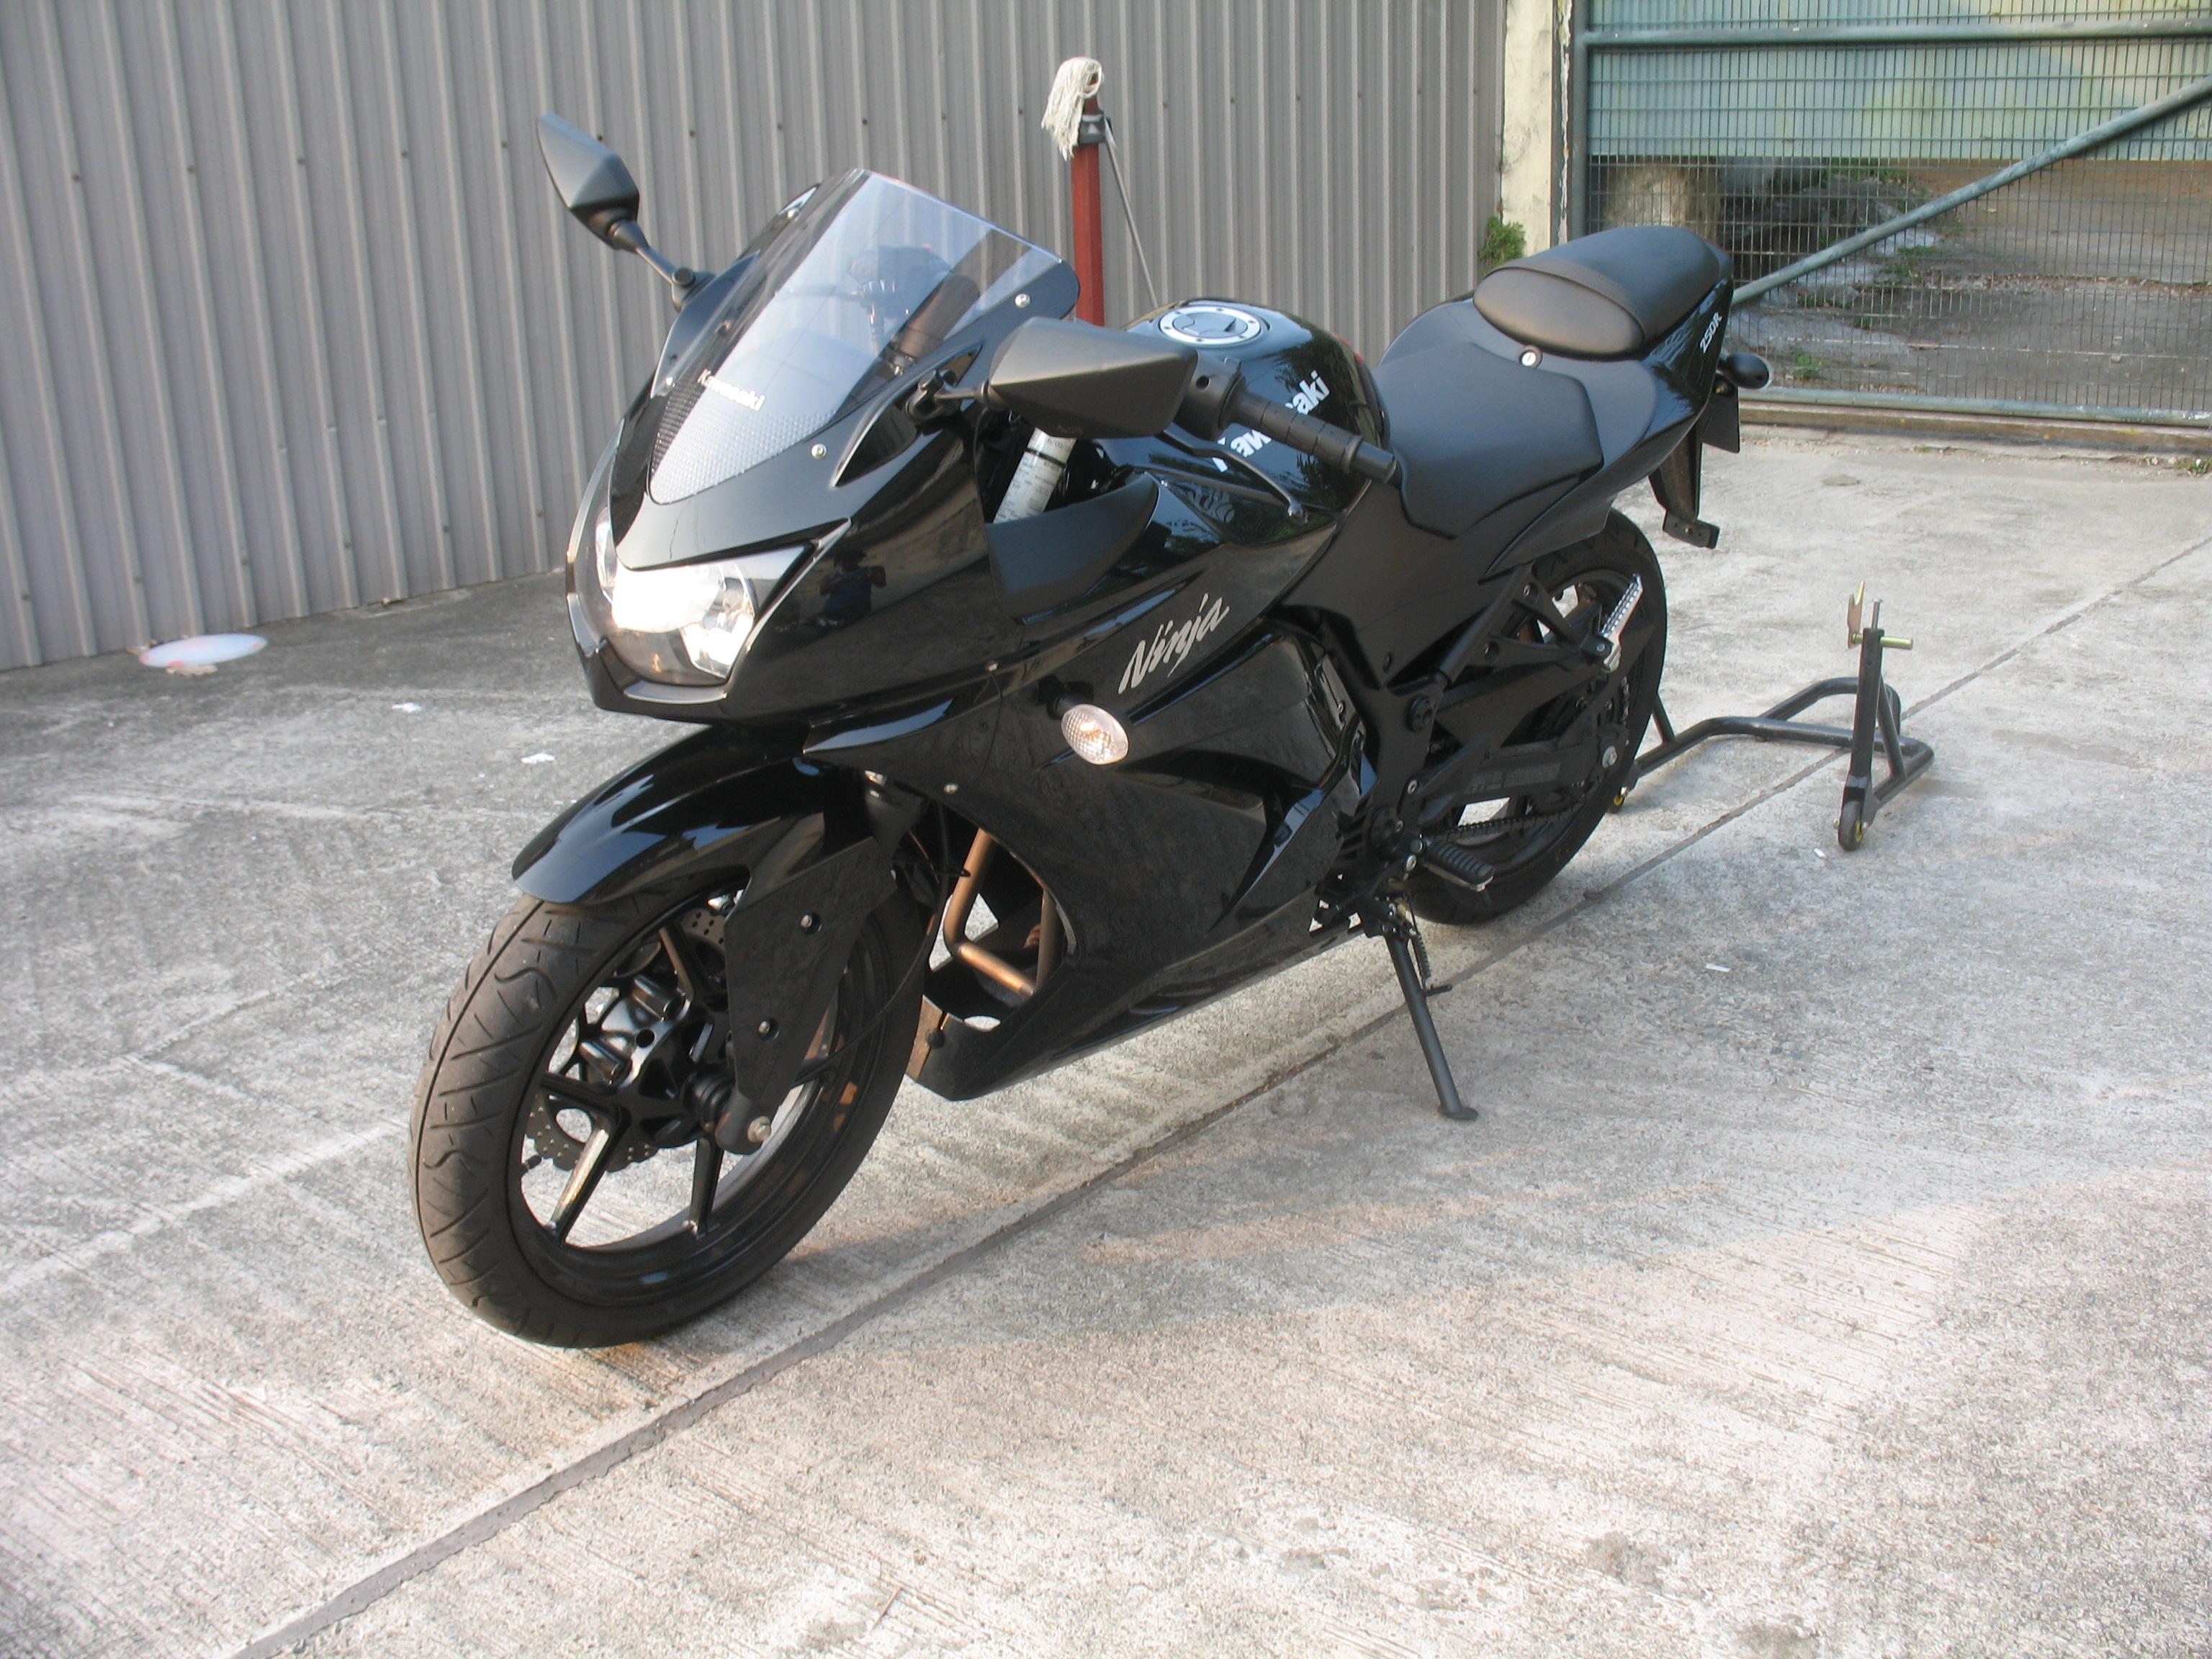 File:2009 Kawasaki Ninja 250R Black.jpg - Wikimedia Commons